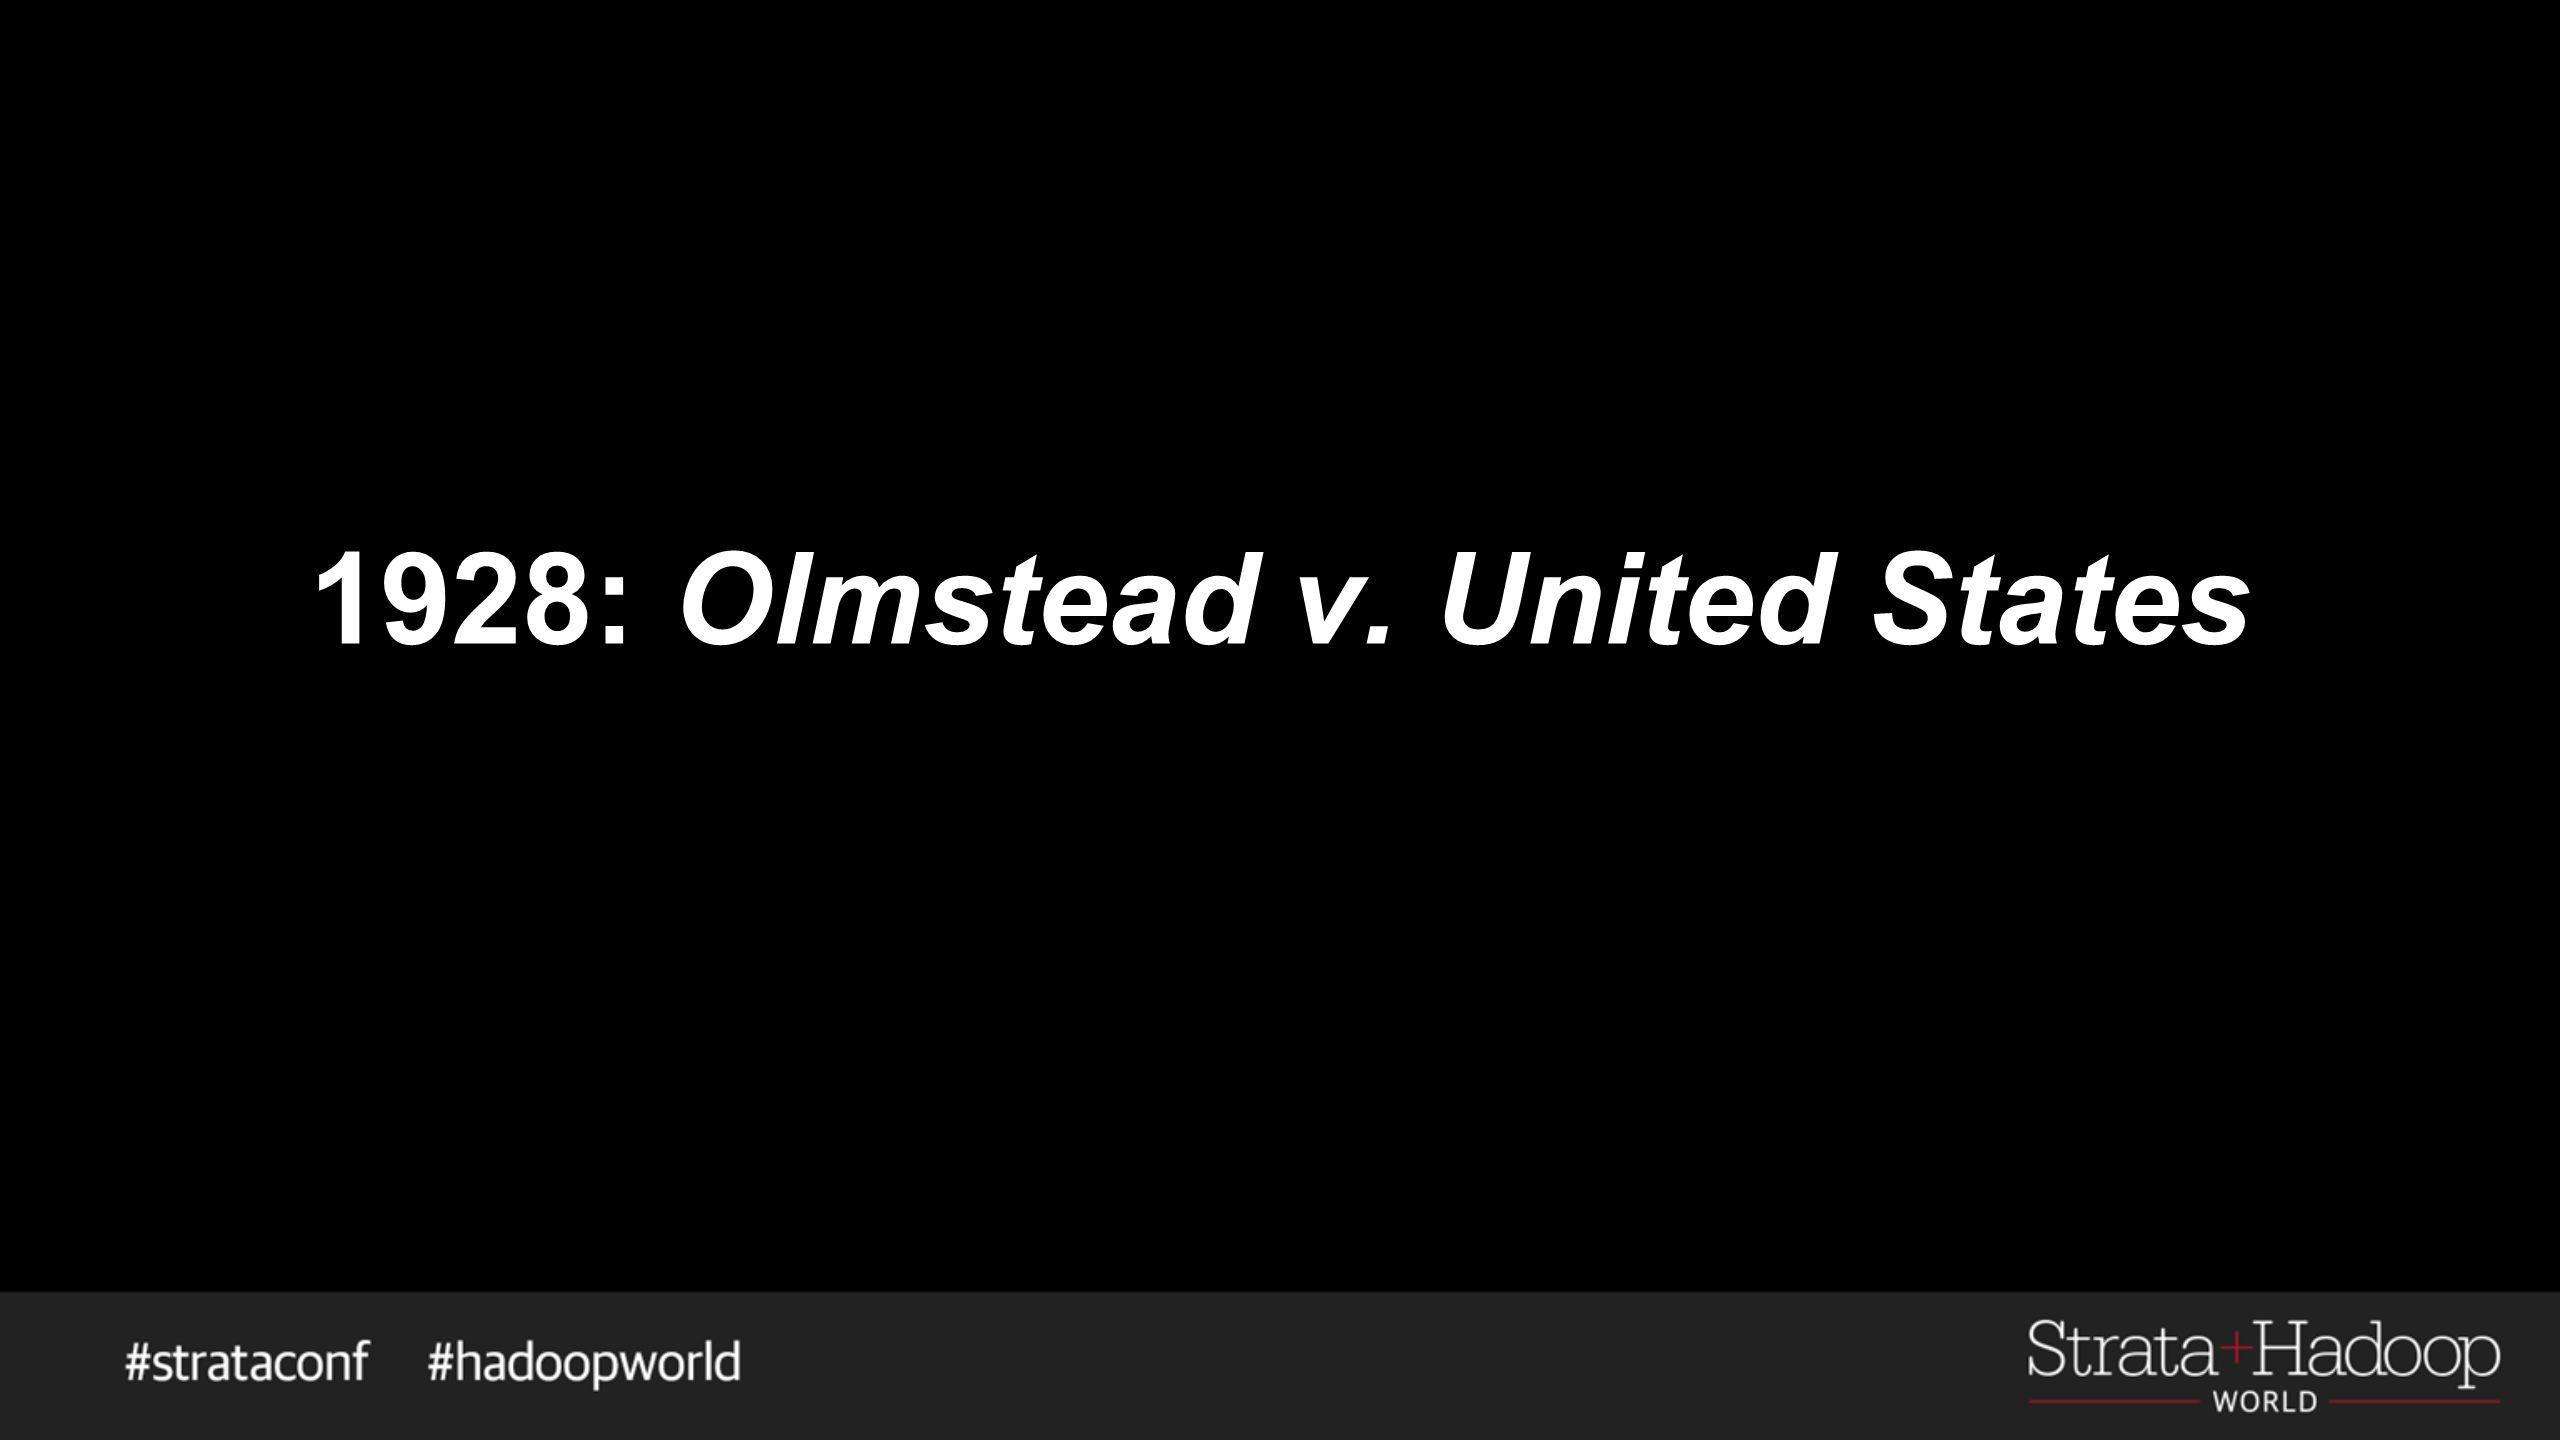 1928: Olmstead v. United States